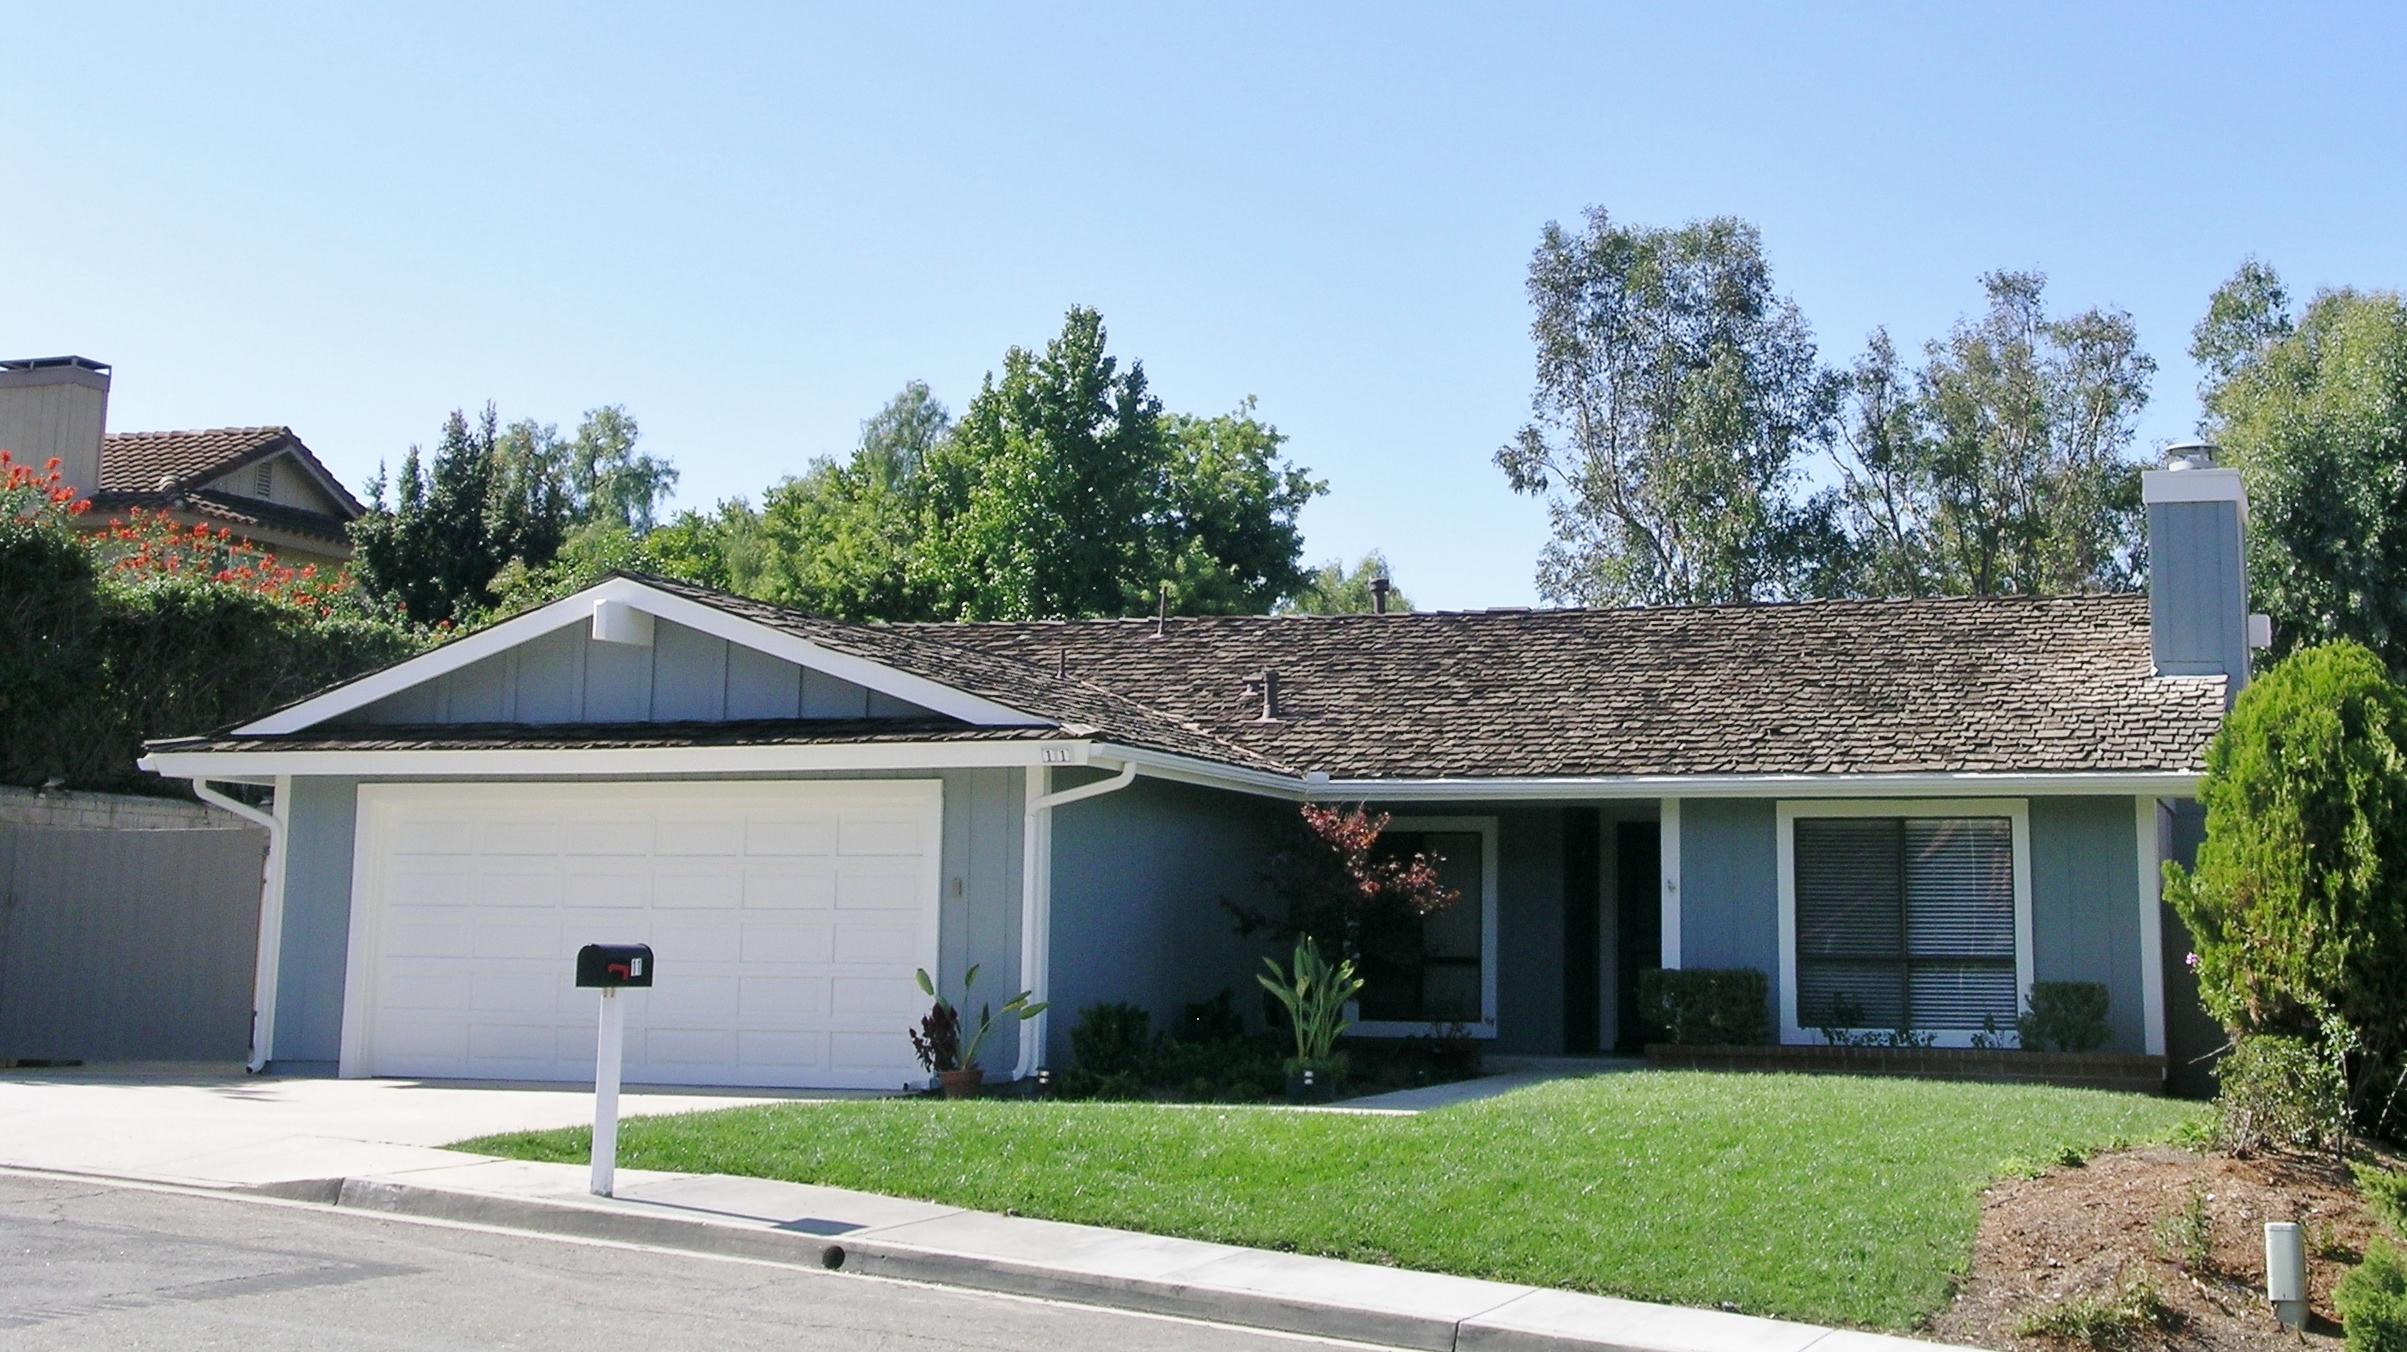 House Painting Thousand Oaks Ca